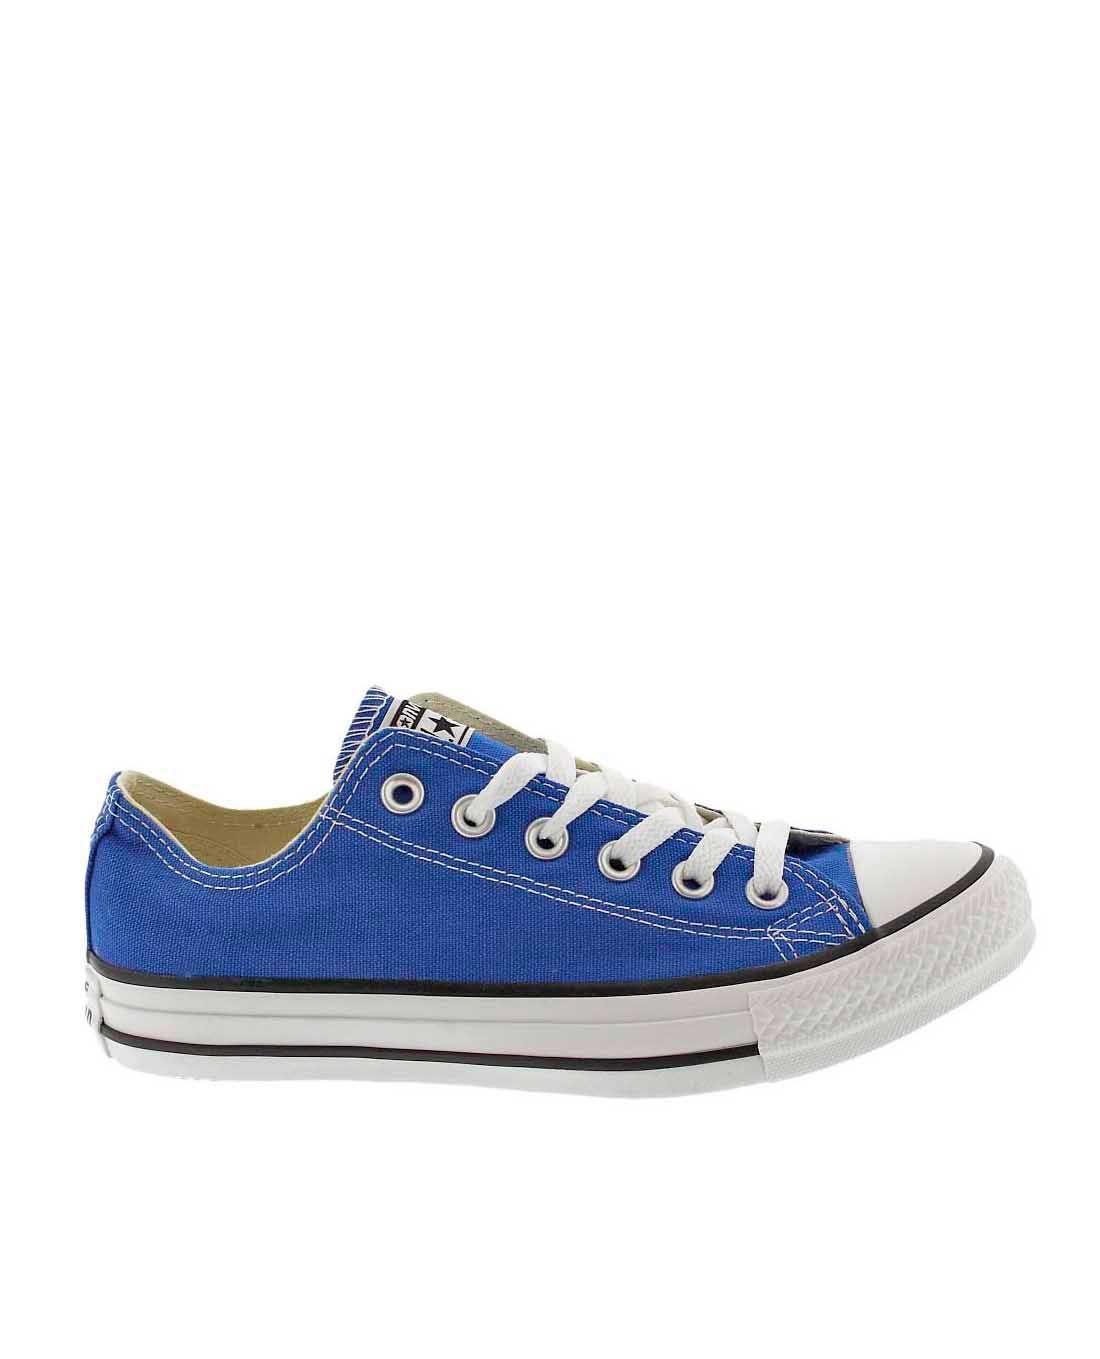 newest collection 11a01 855f0 Zapatillas CONVERSE azul 144809F